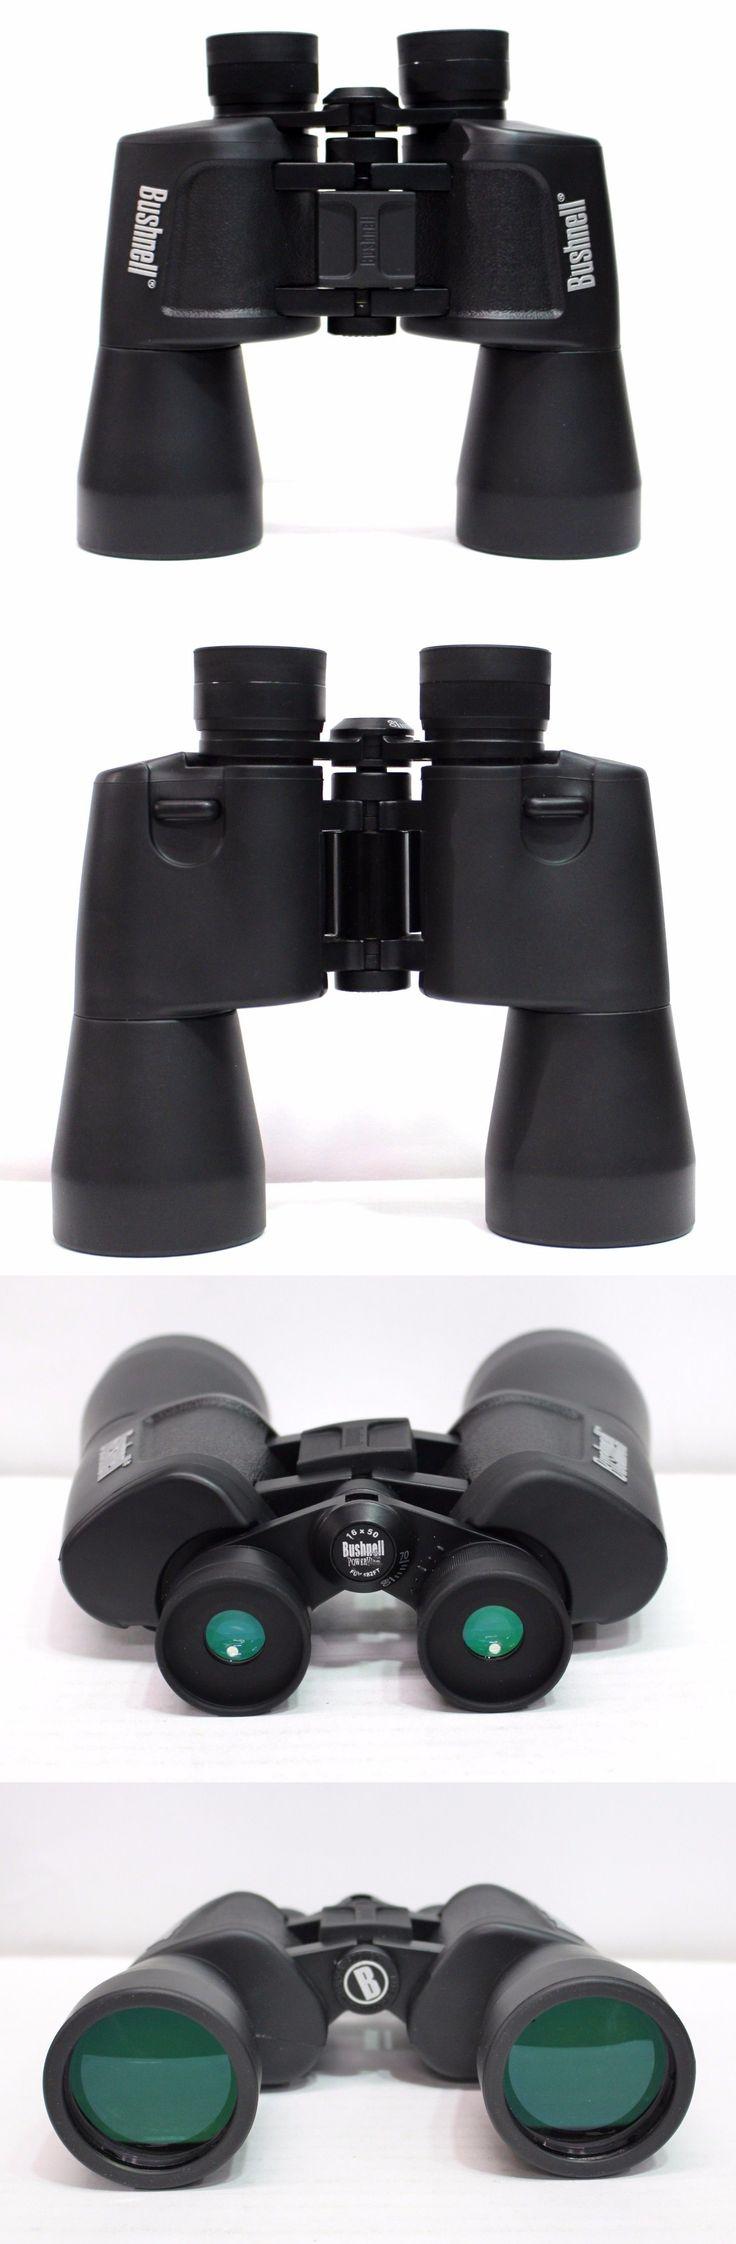 Hunting Binoculars 31711: New! Bushnell Powerview Binoculars 16X50 Model 131650 -> BUY IT NOW ONLY: $44.97 on eBay!